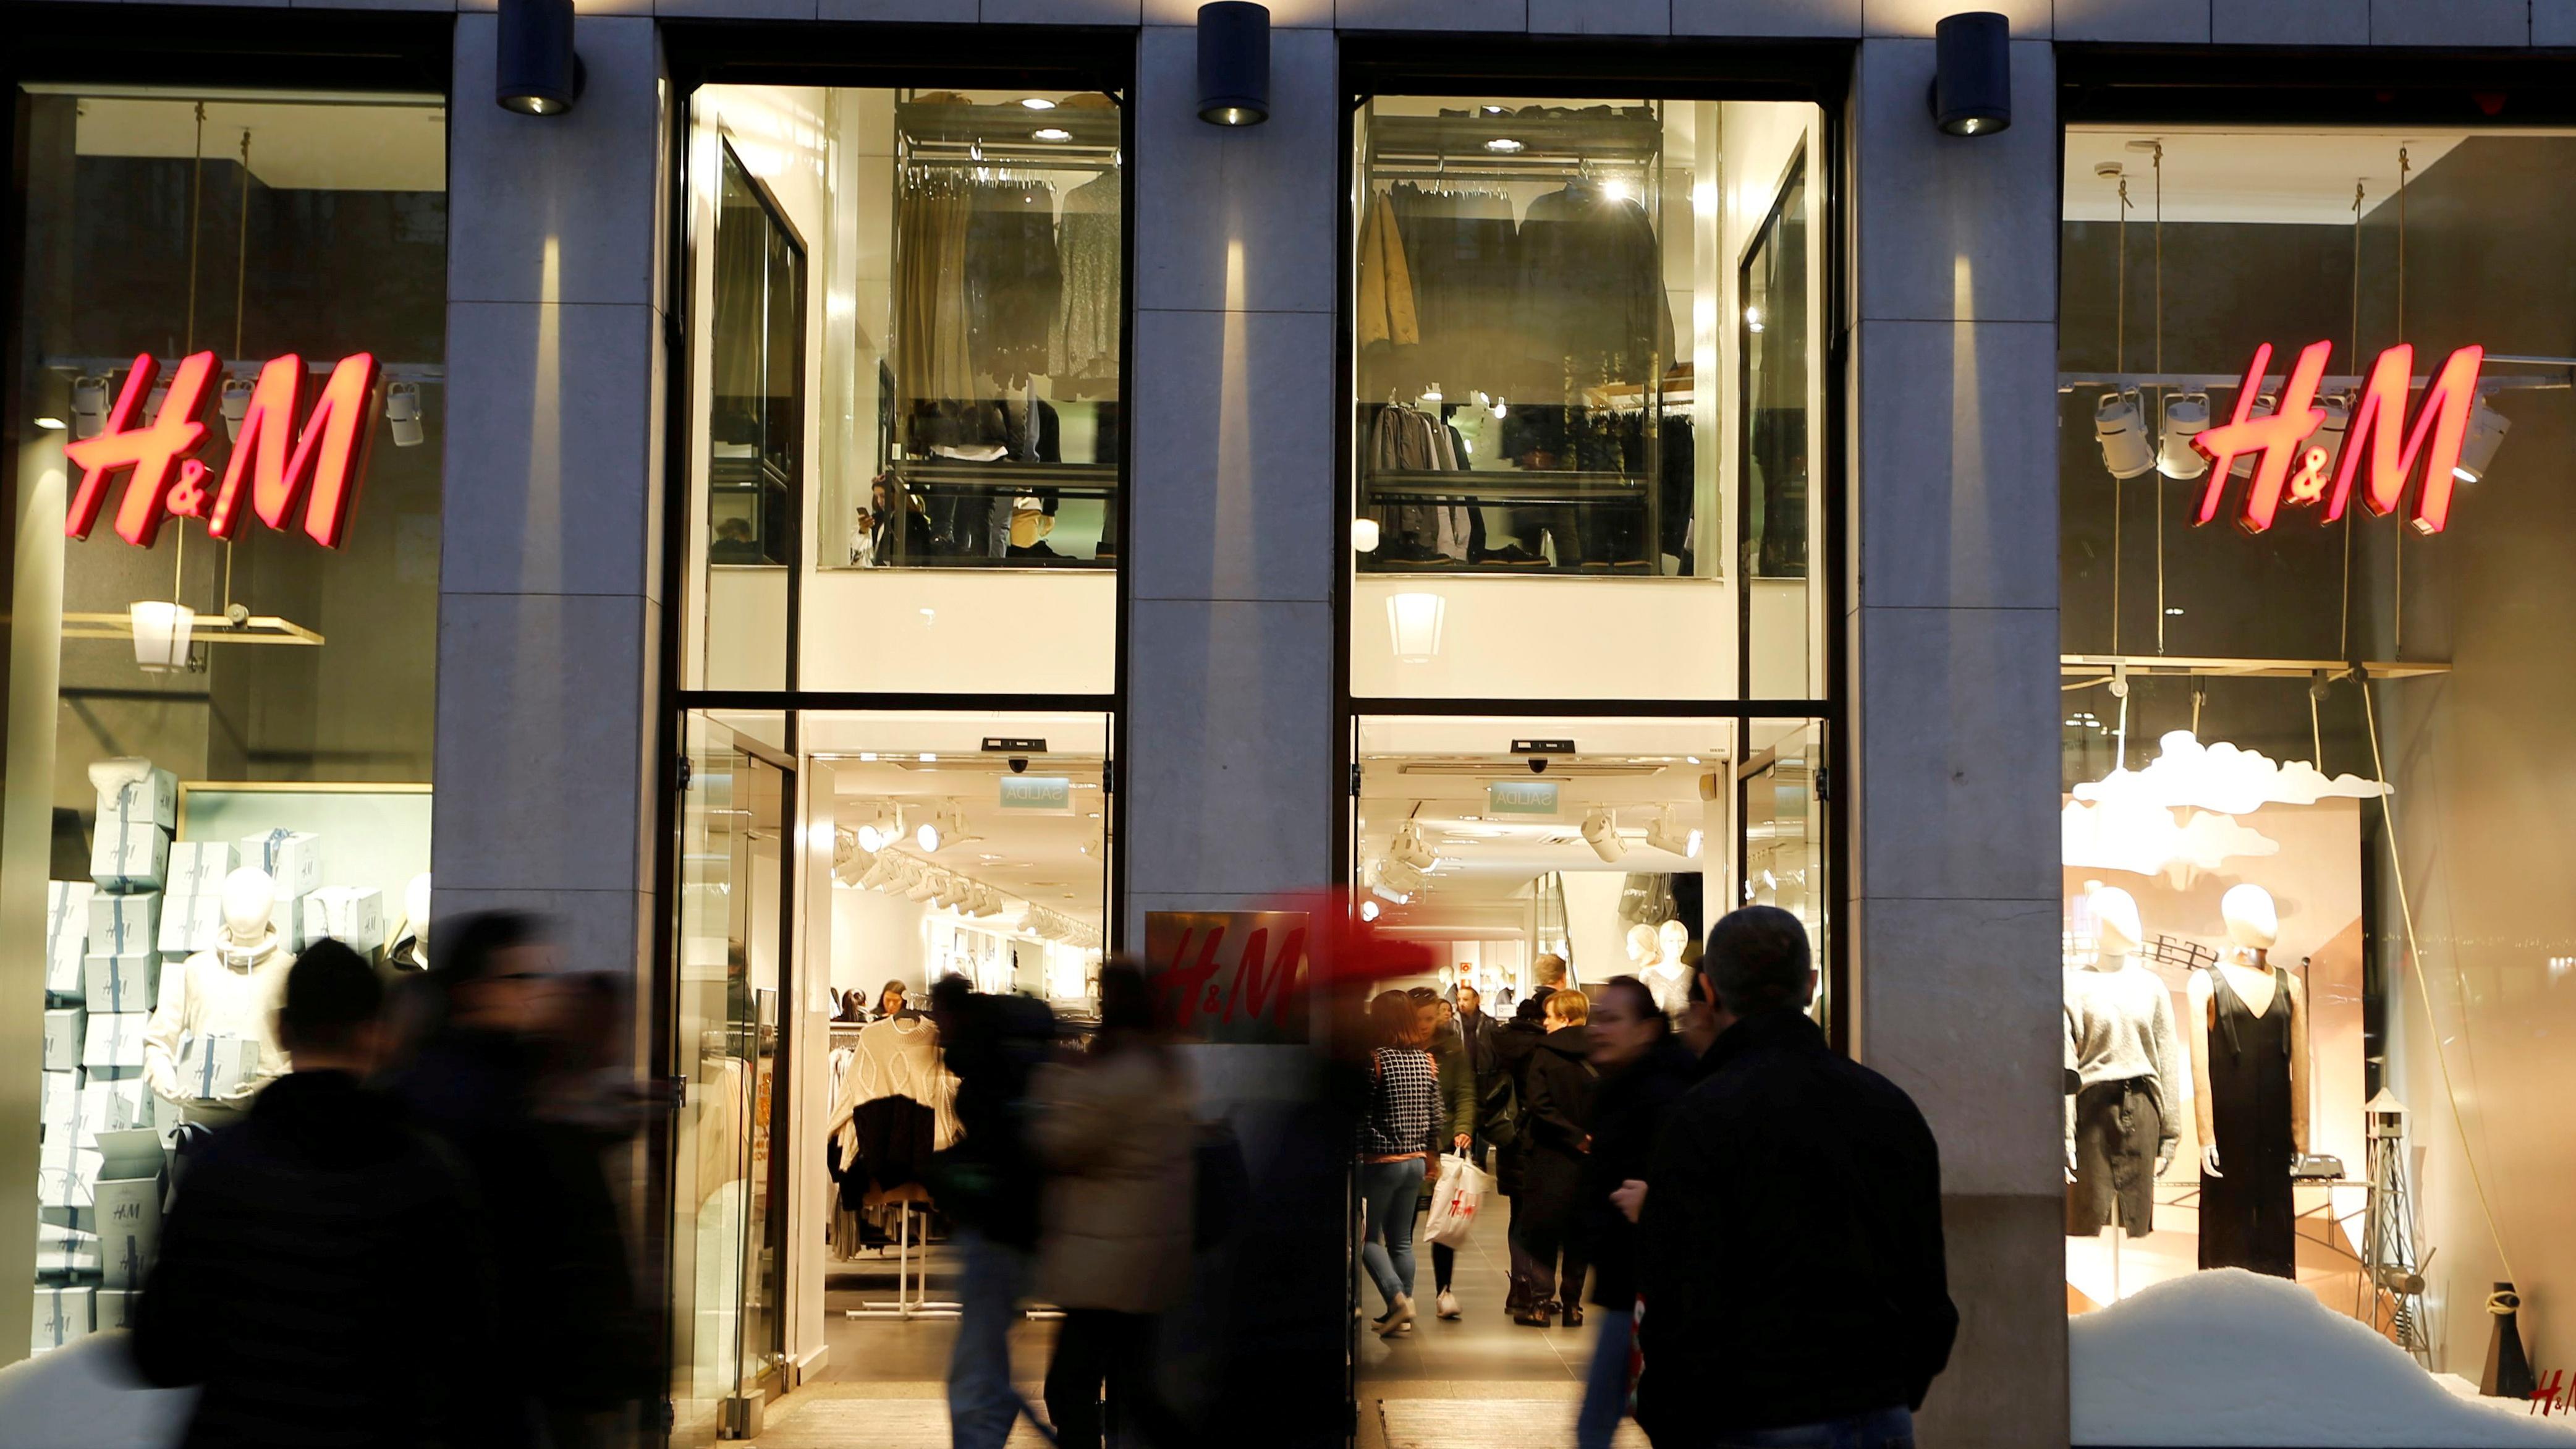 People walk past the windows of an H&M store in Barcelona, Spain, December 30, 2016. REUTERS/Regis Duvignau/File Photo